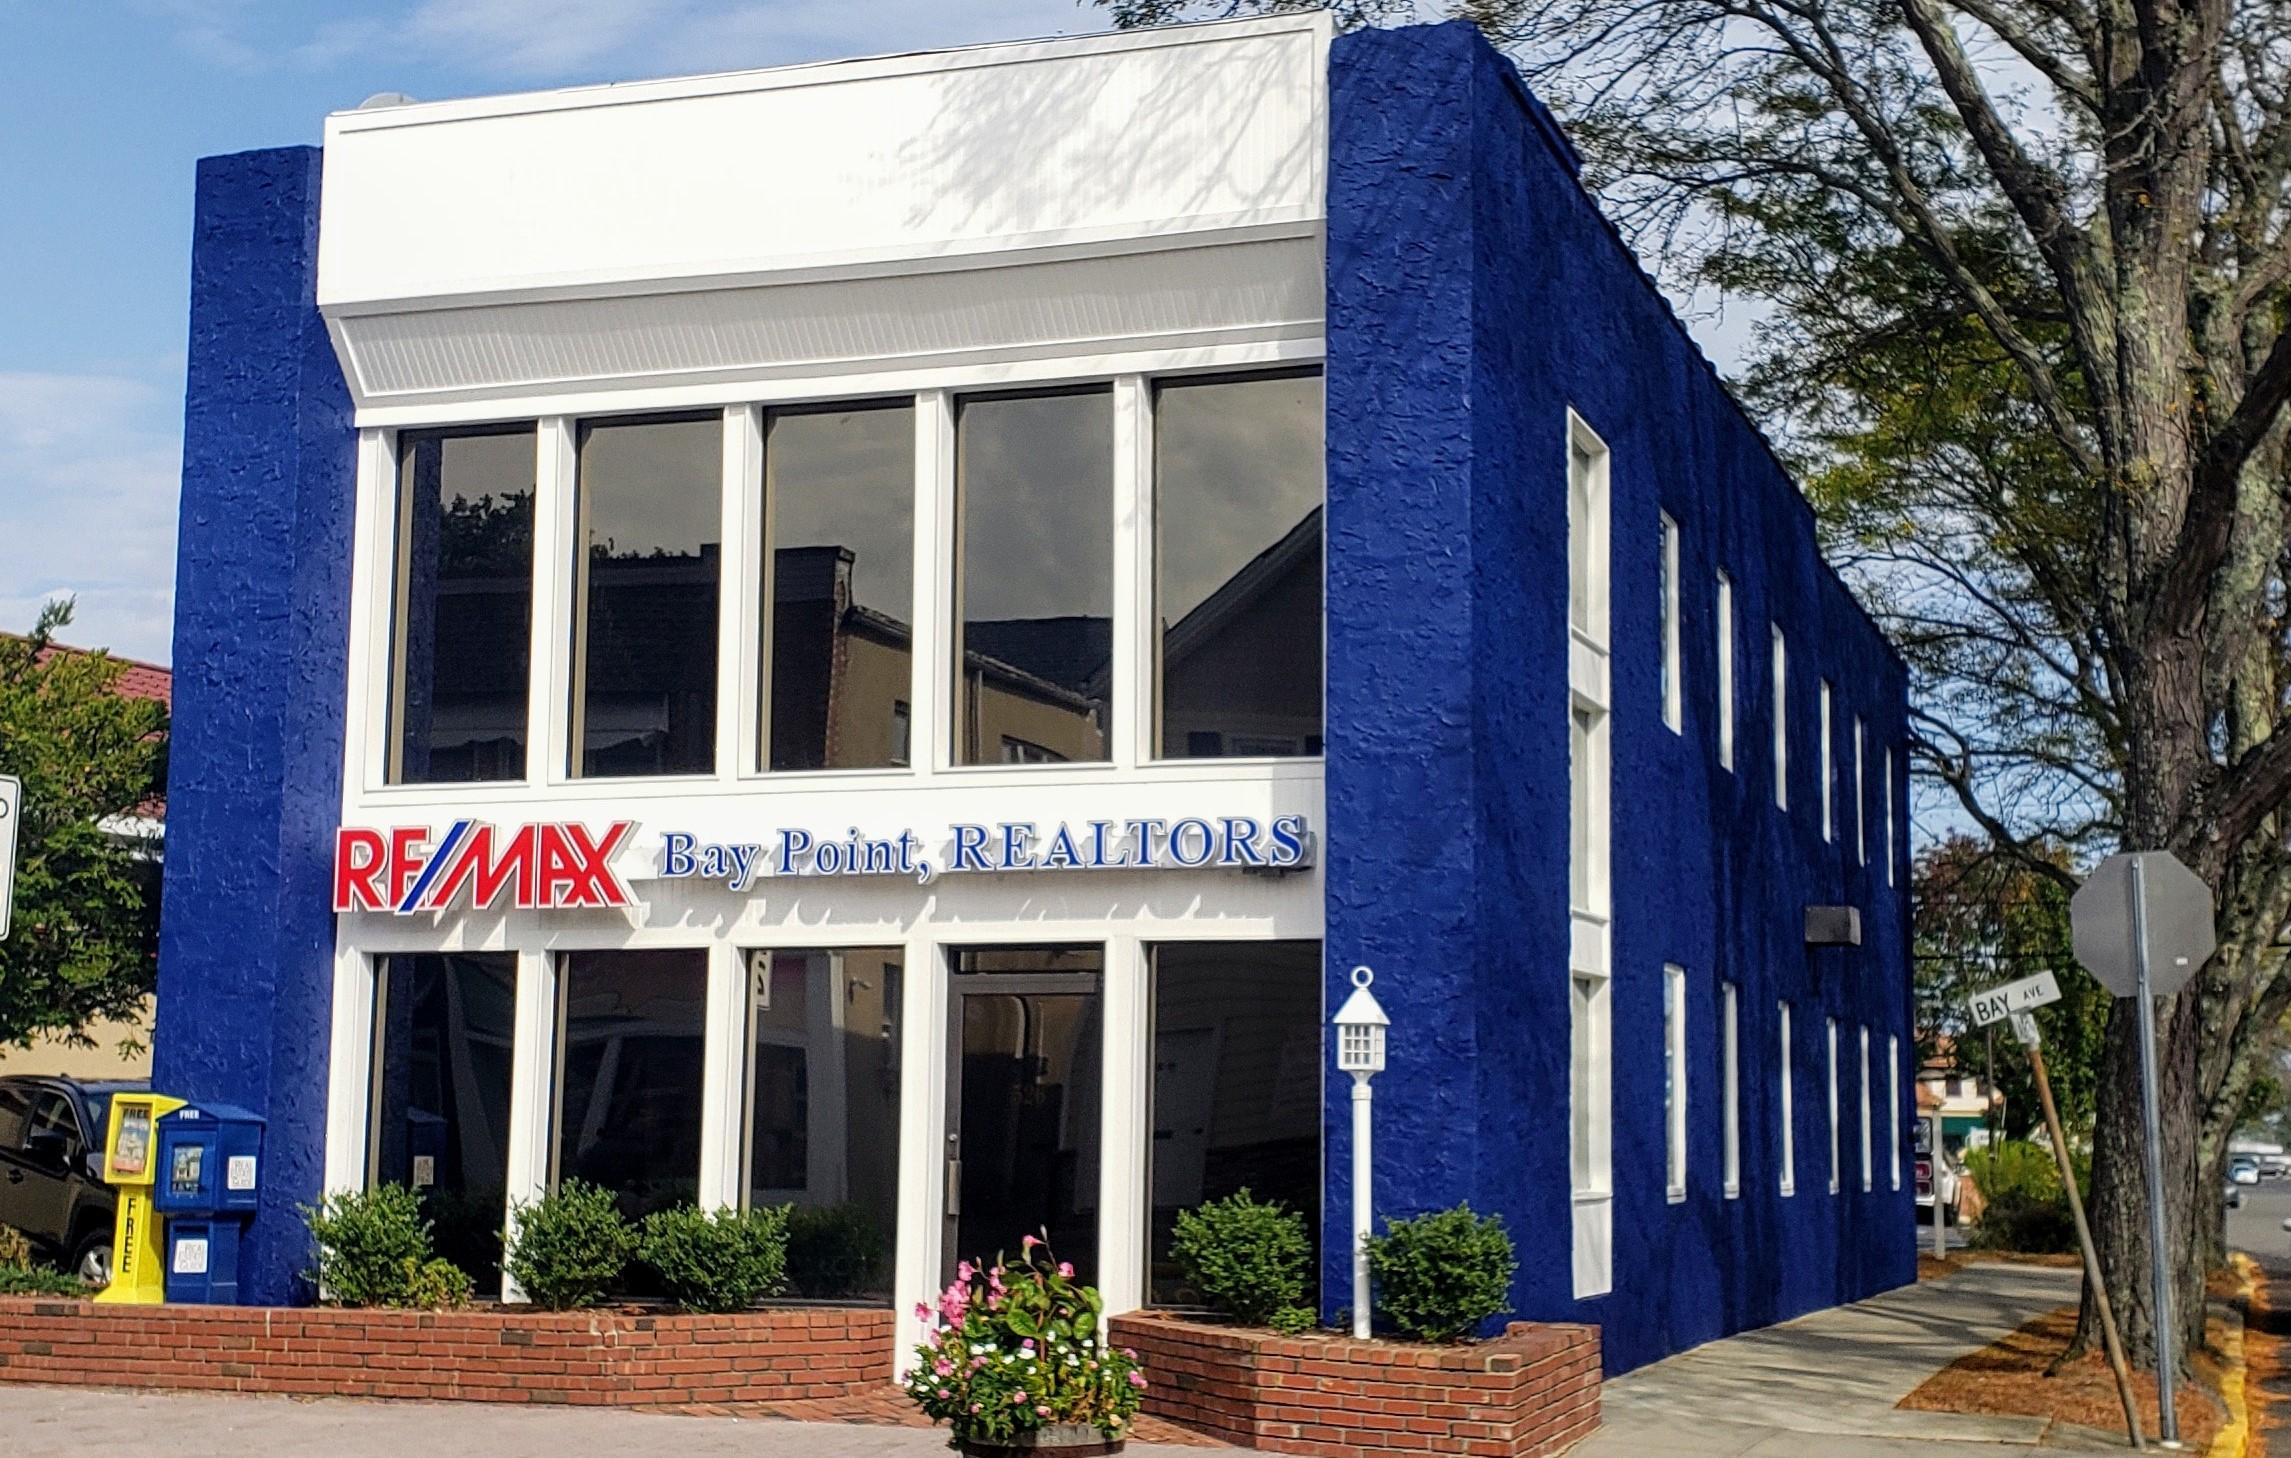 RE/MAX Bay Point Realtors